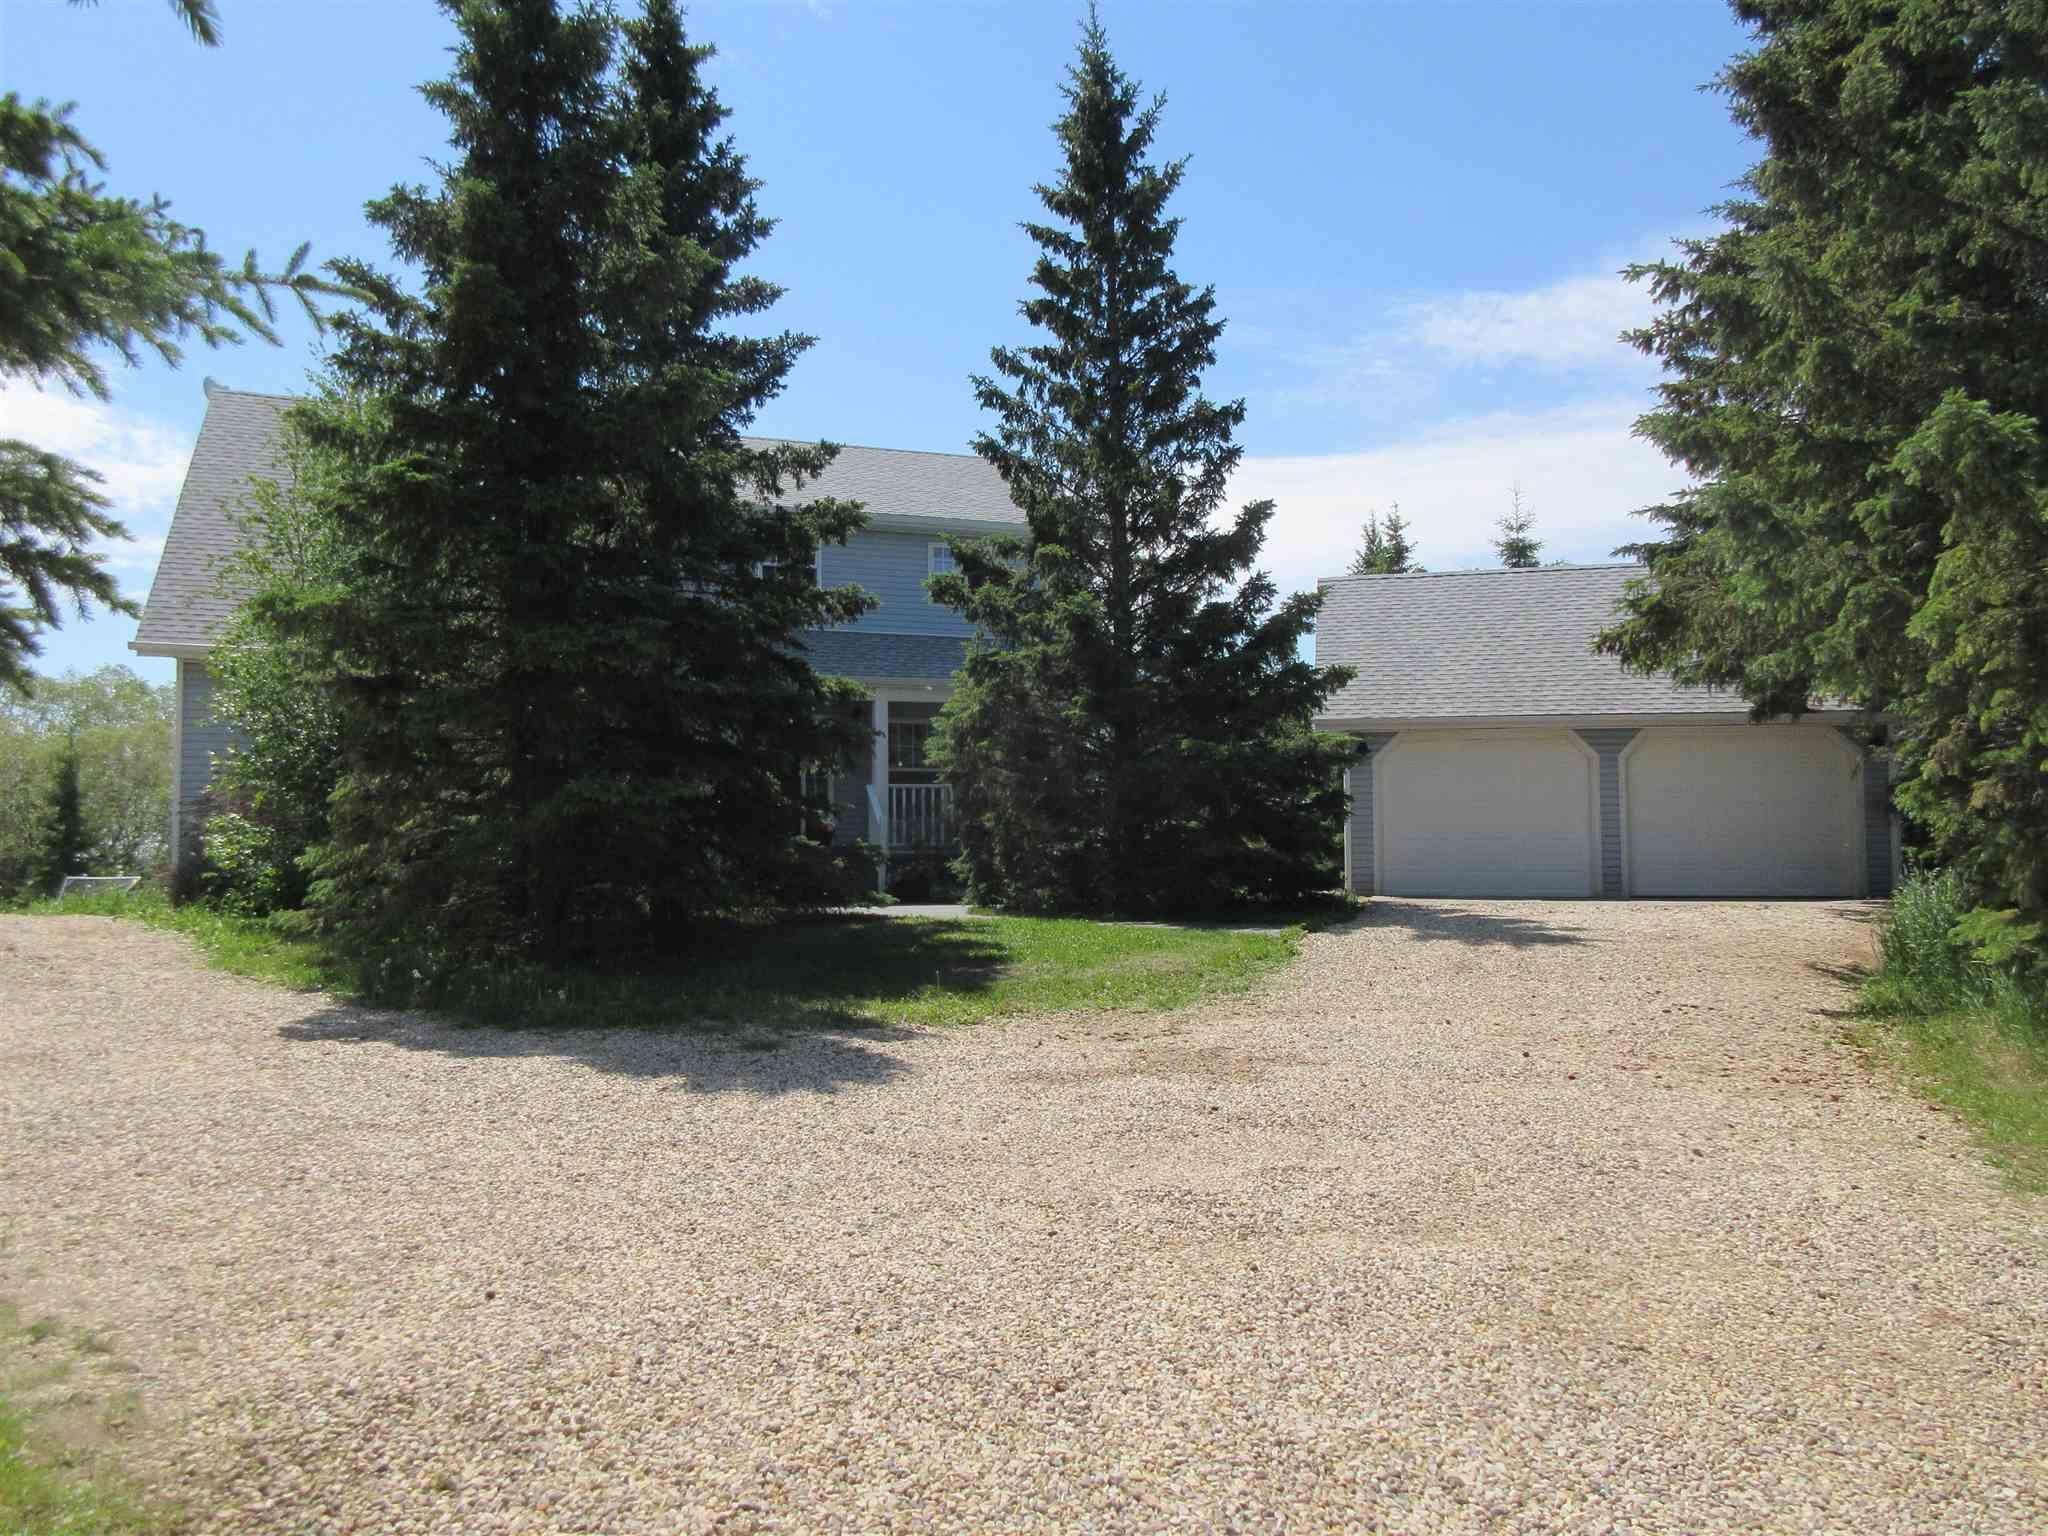 Main Photo: 26515 SH 633: Rural Sturgeon County House for sale : MLS®# E4251612